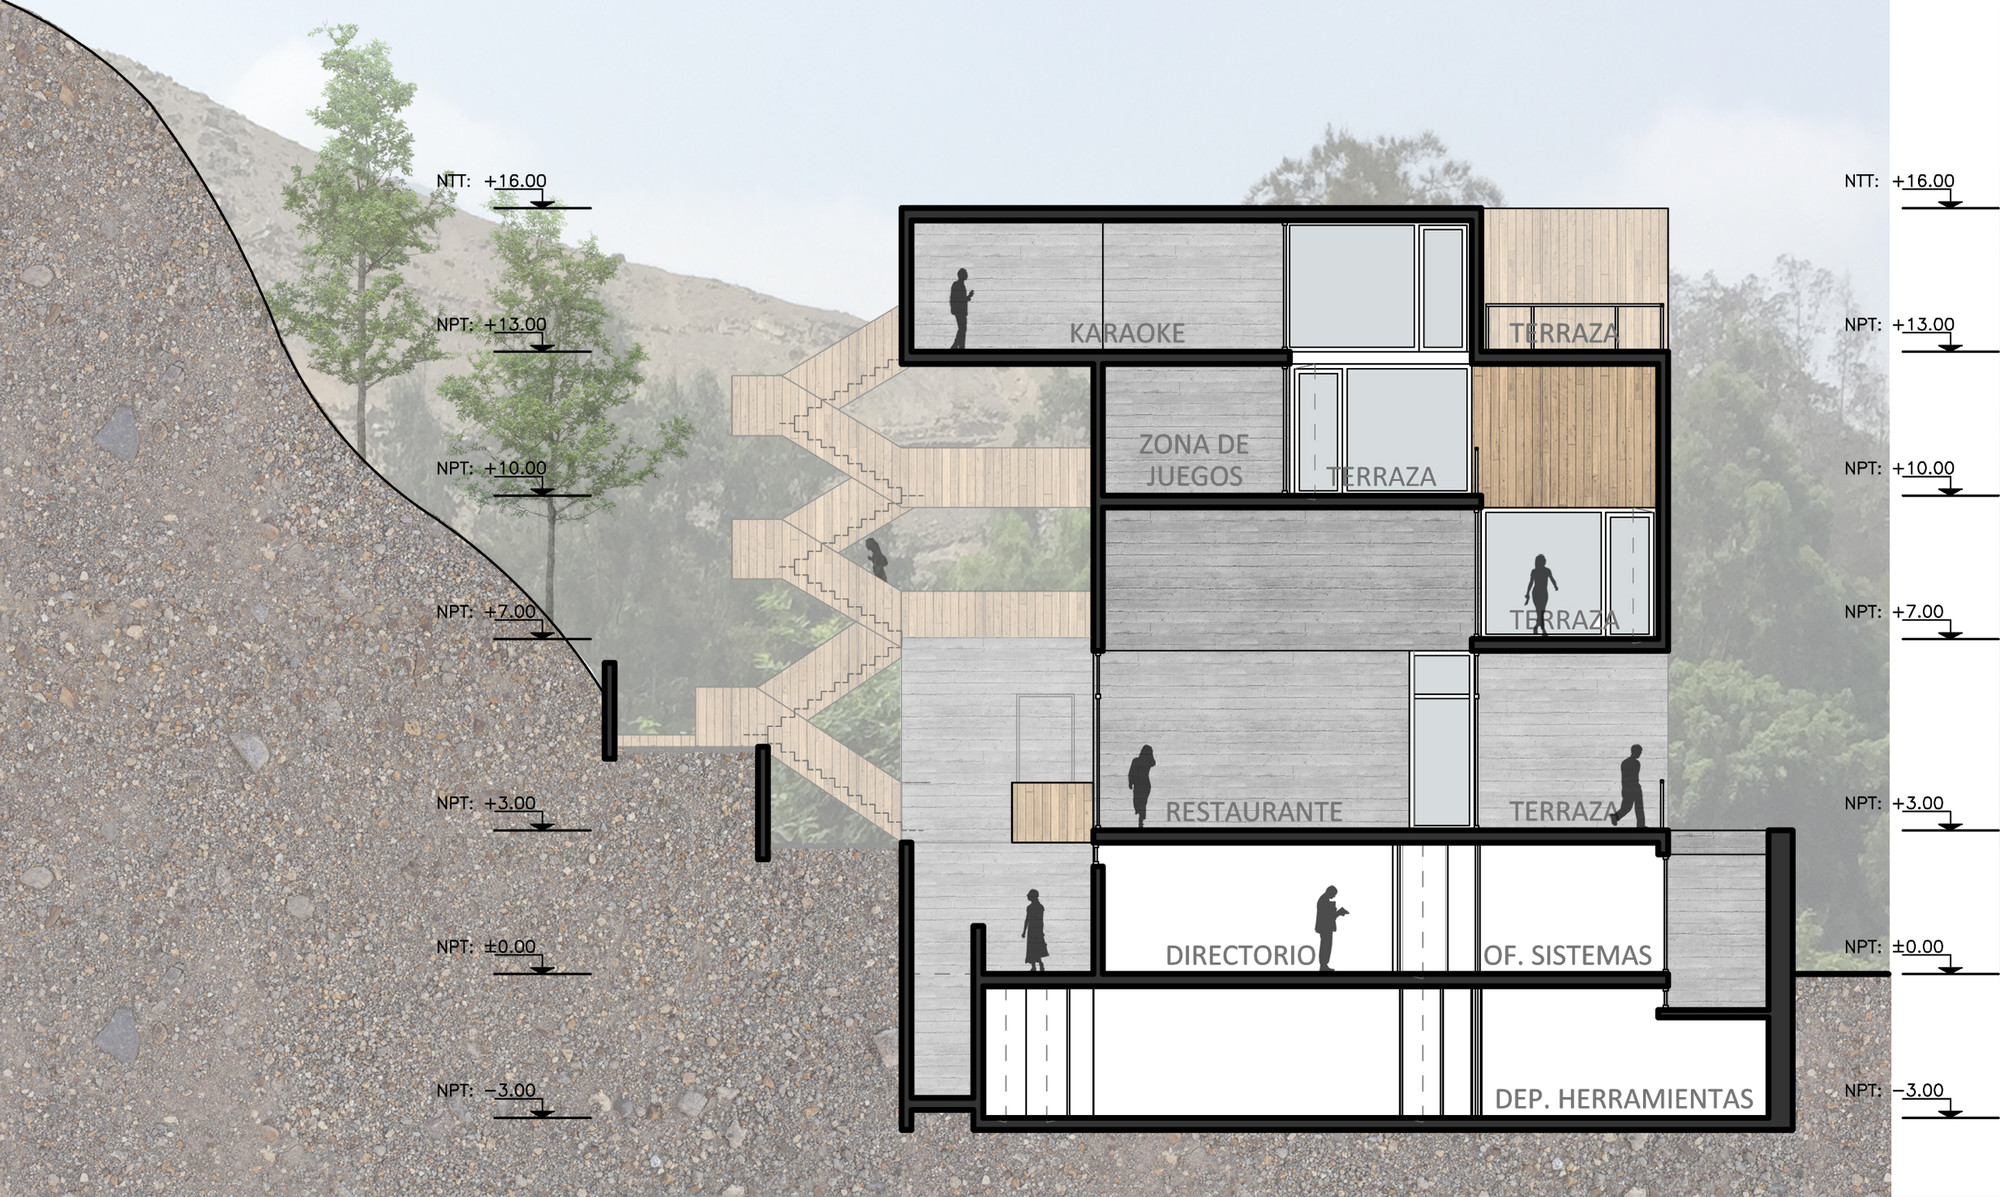 Galer a de seinfeld arquitectos tandem arquitectura for Arquitectura nota de corte